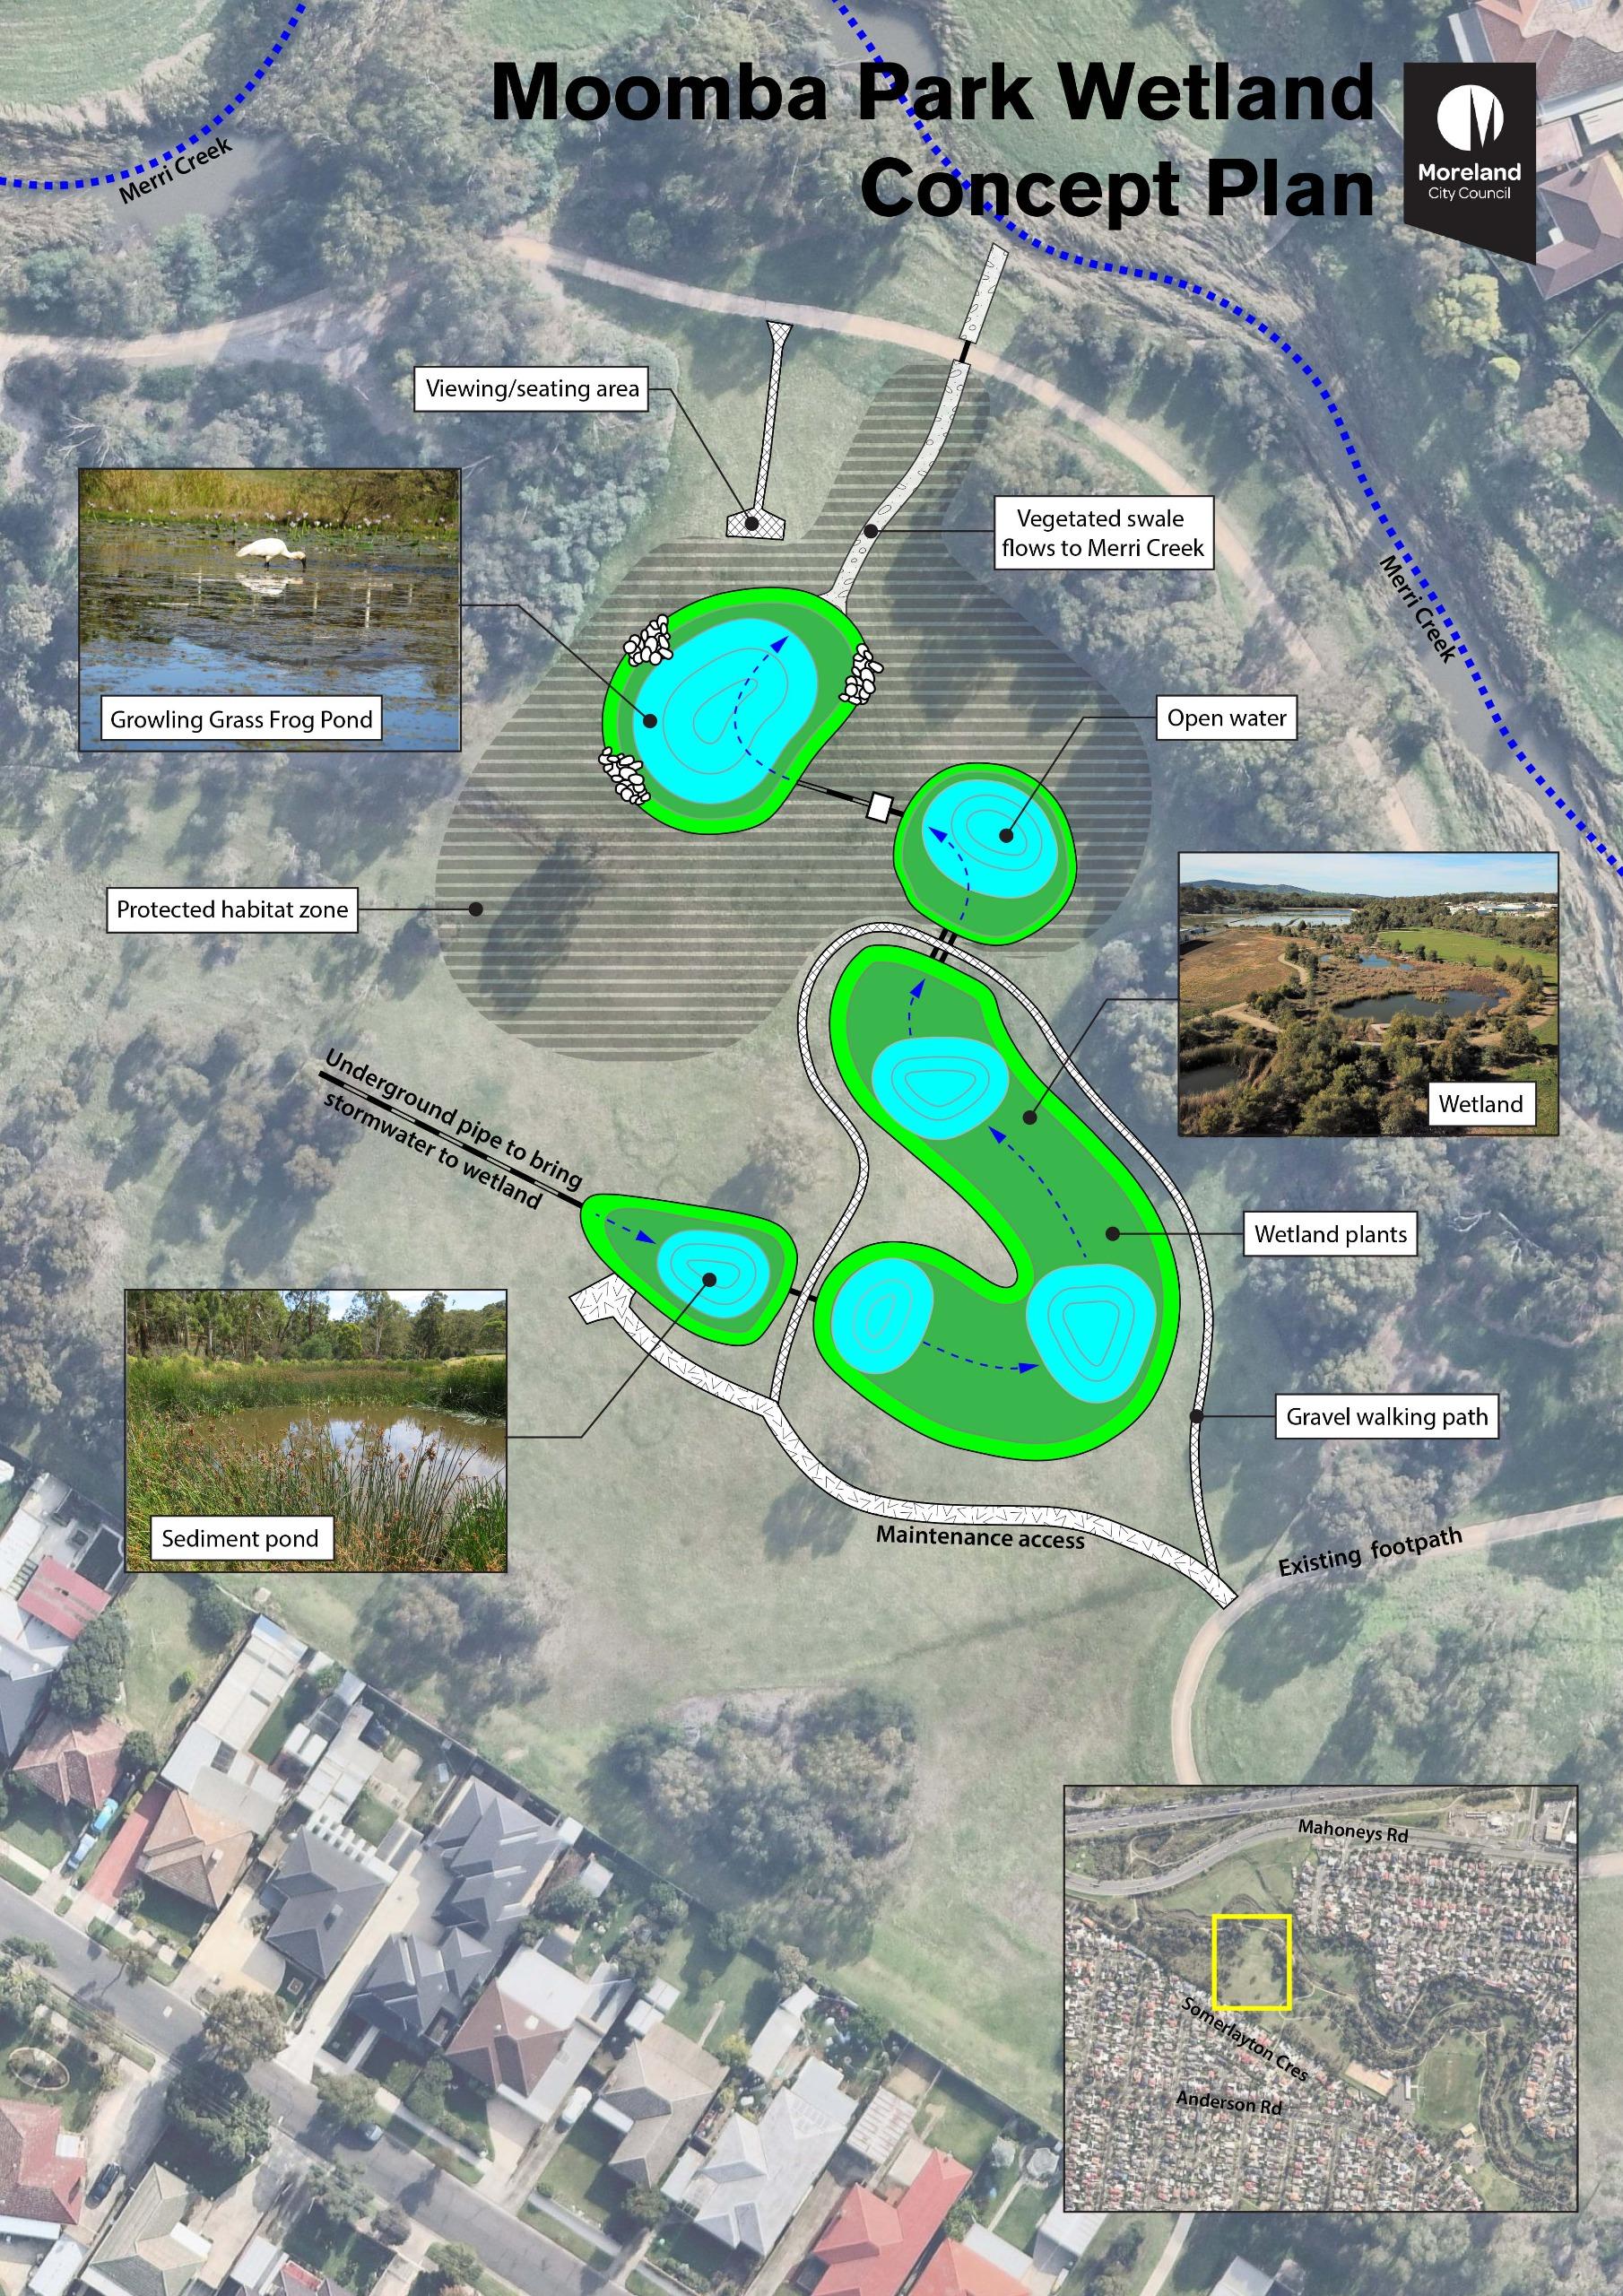 Moomba Park Wetland Concept Diagram